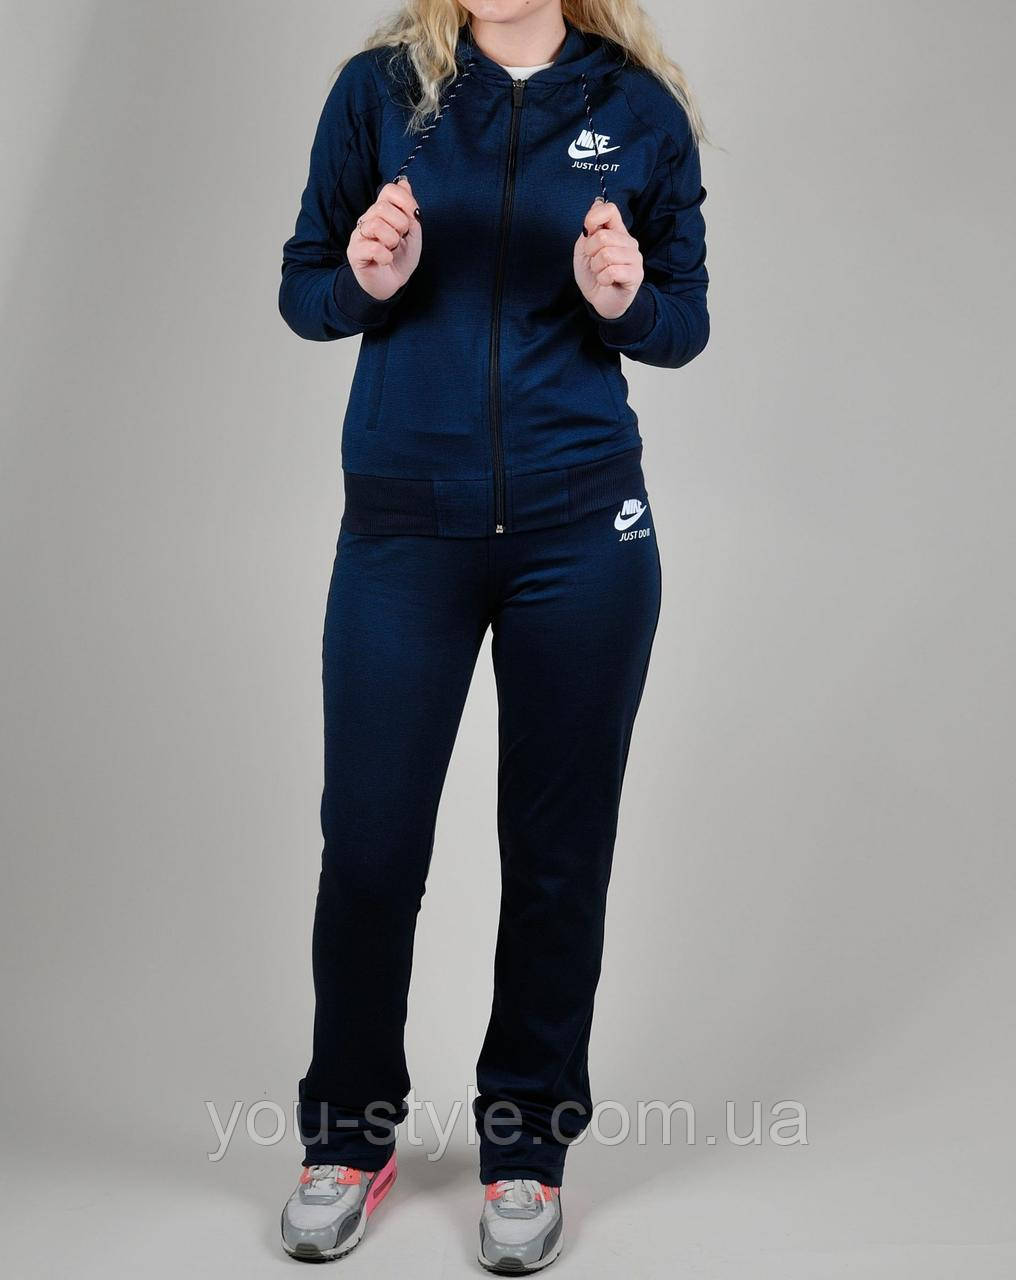 a0aca6c0 Женский спортивный костюм Nike 1143 Тёмно-синий - Интернет магазин